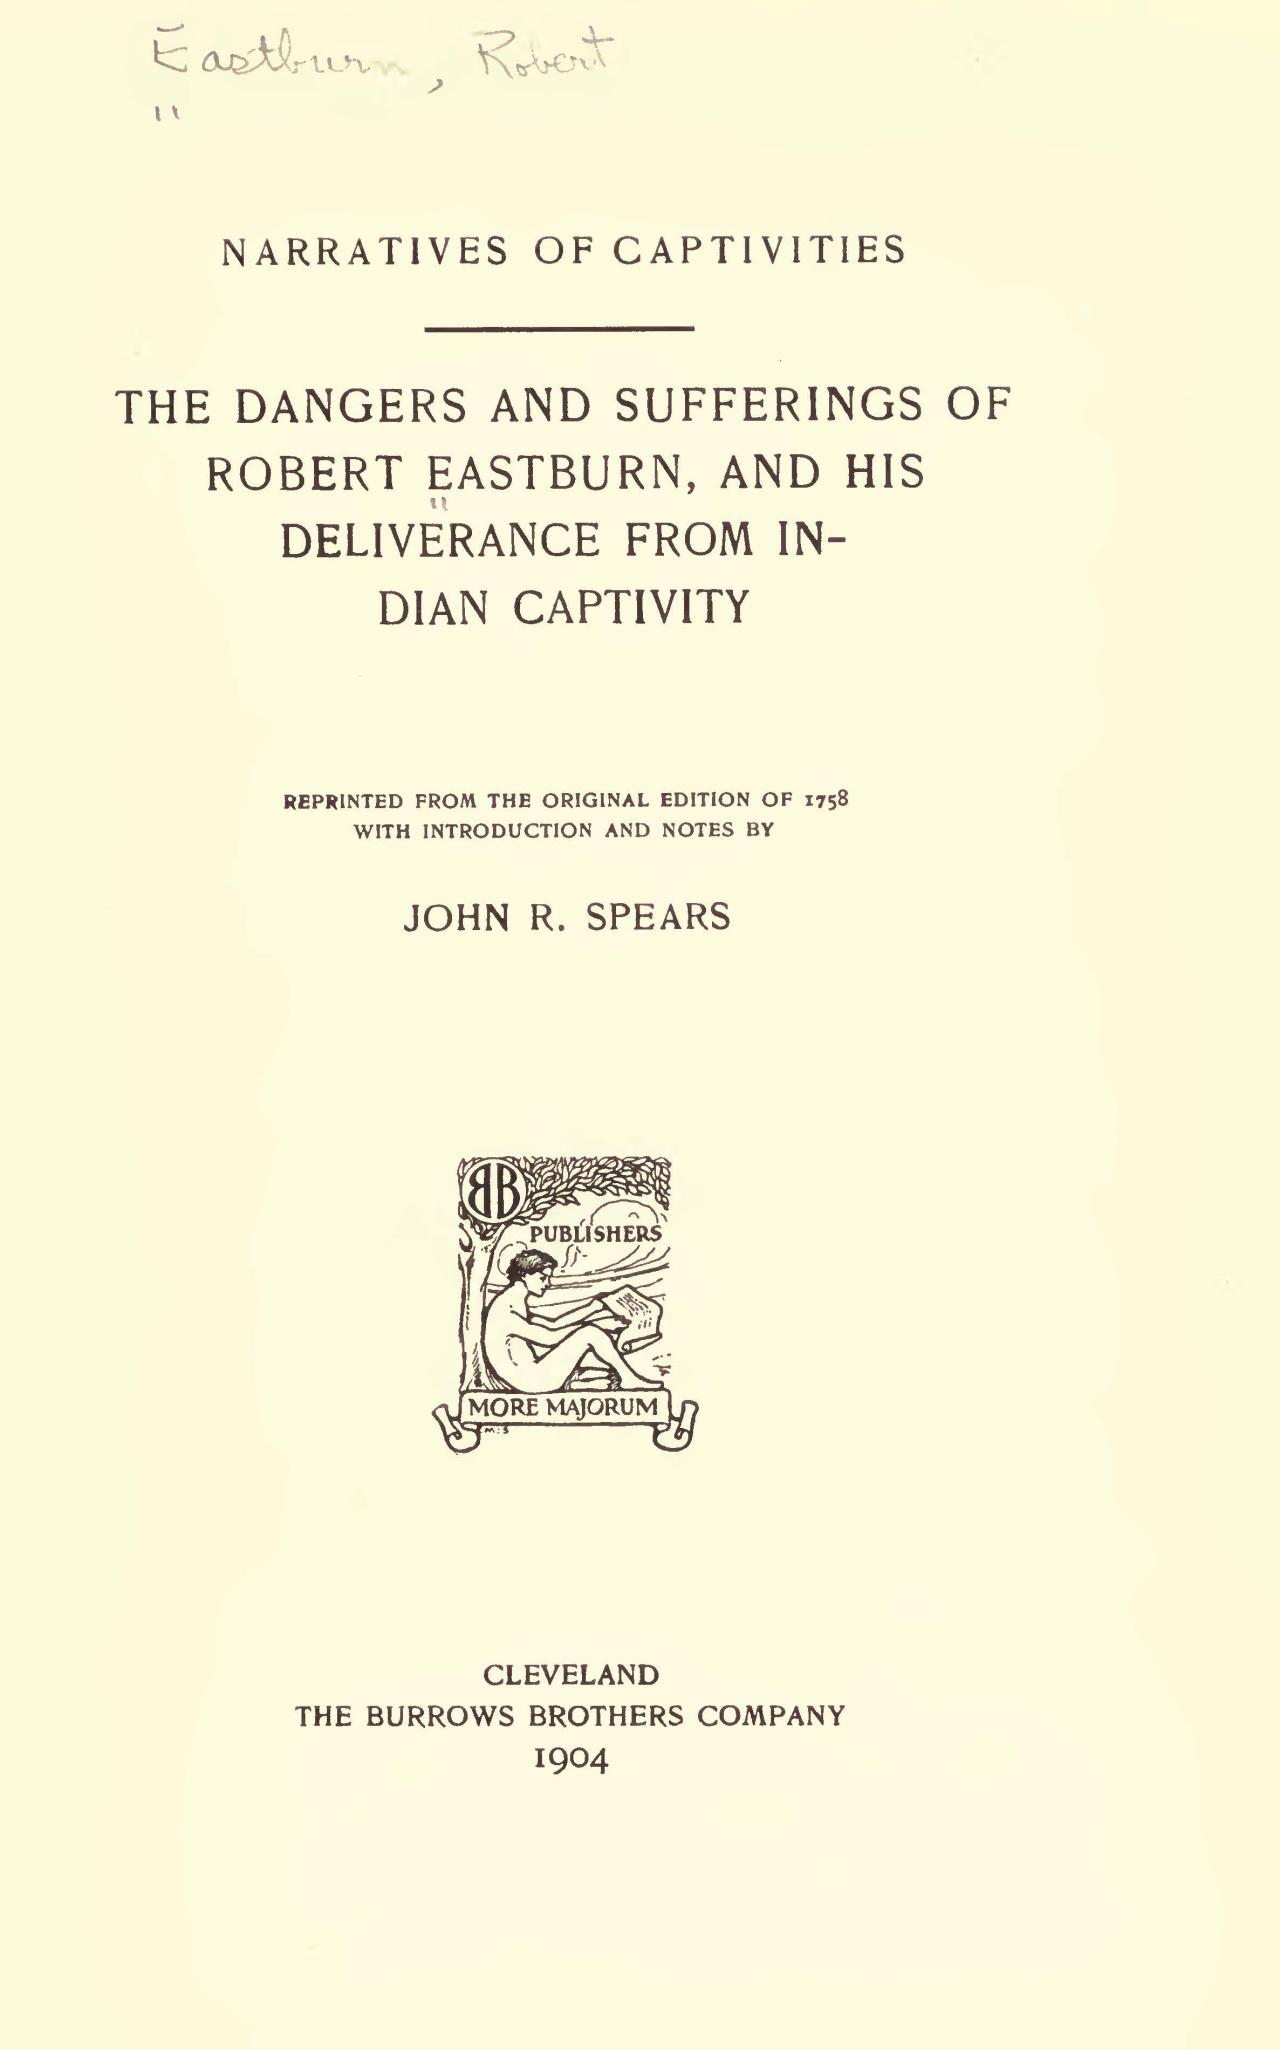 Eastburn, Robert, The Dangers and Sufferings of Robert Eastburn Title Page.jpg